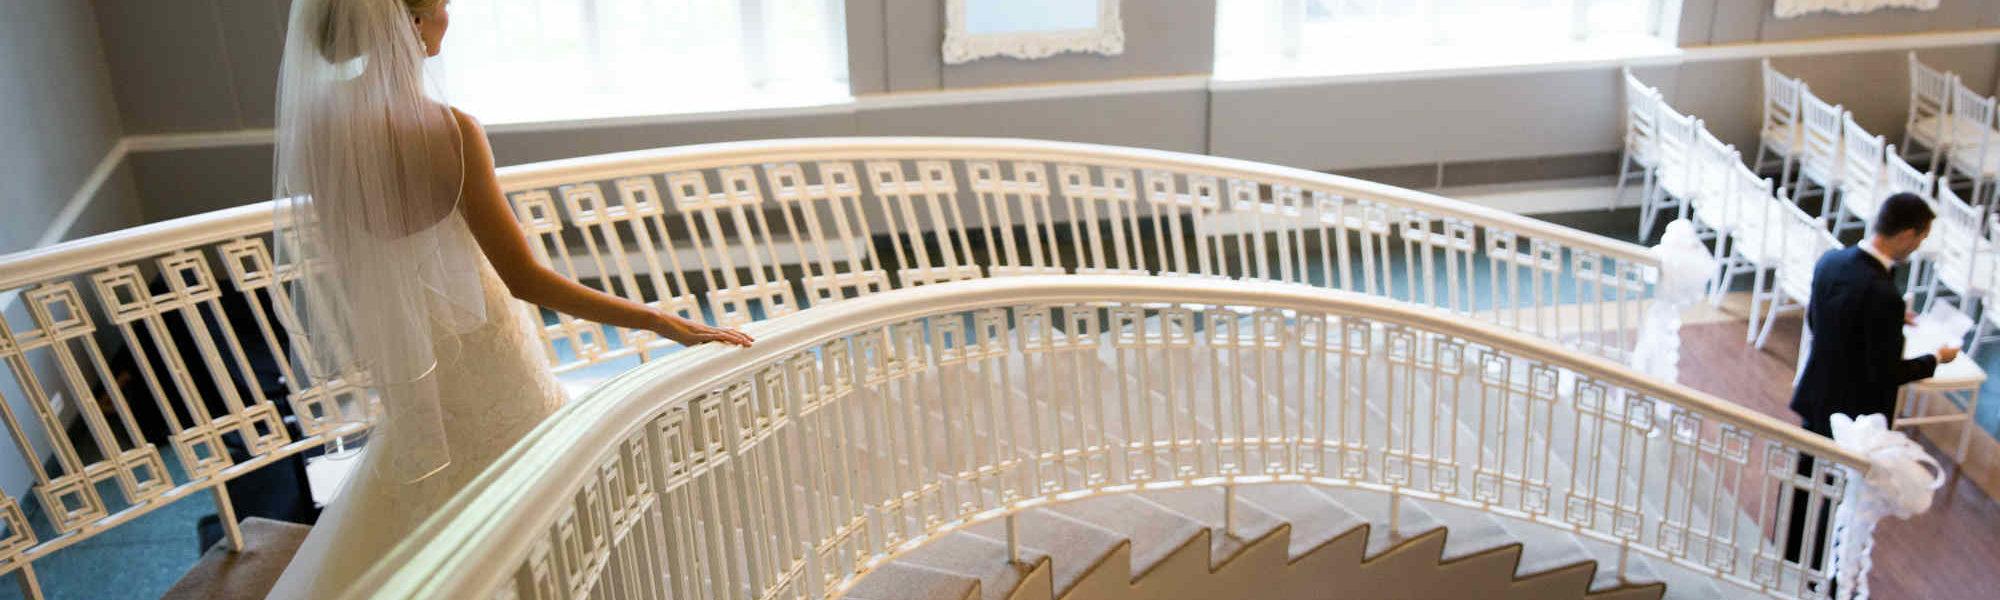 Ewald Voltherm stairs slider